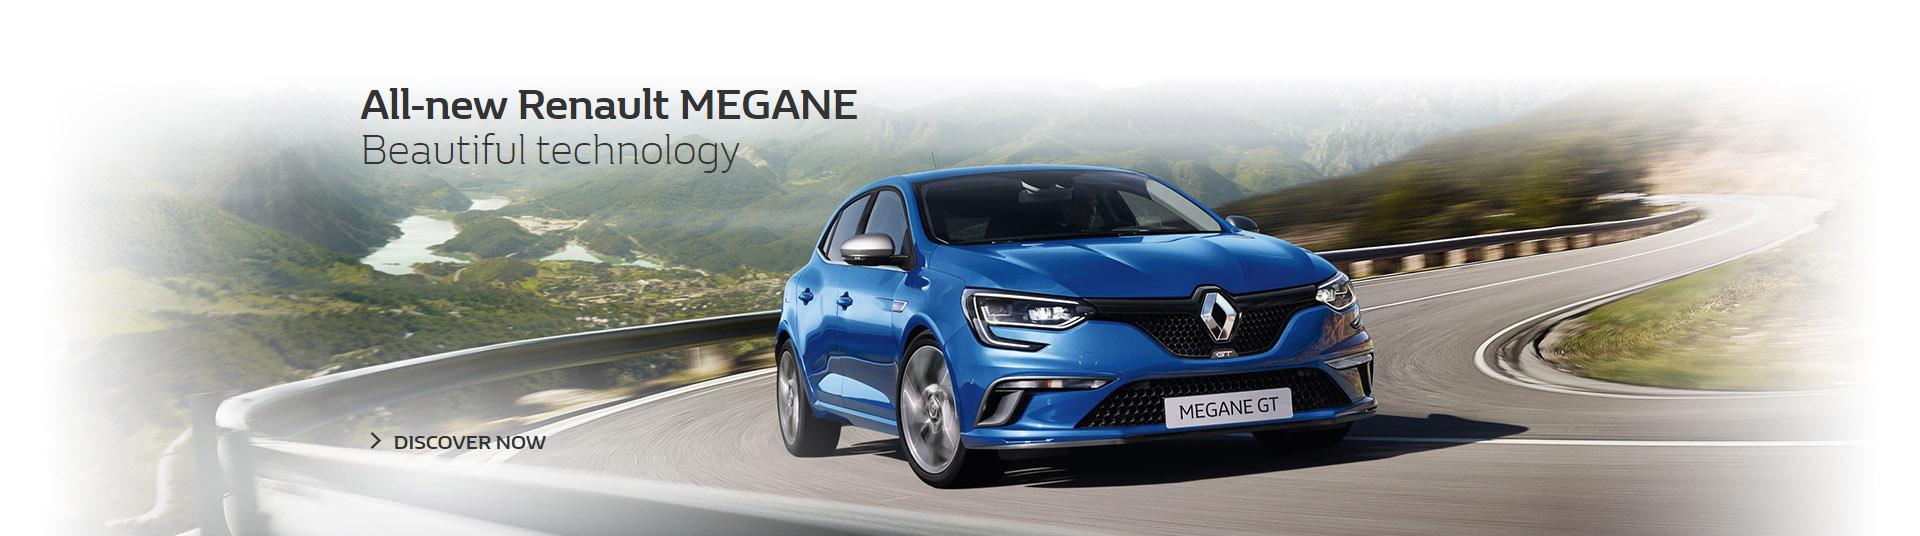 All-new Renault Megane hatch, beautiful technology on sale at Metro Renault Brisbane.